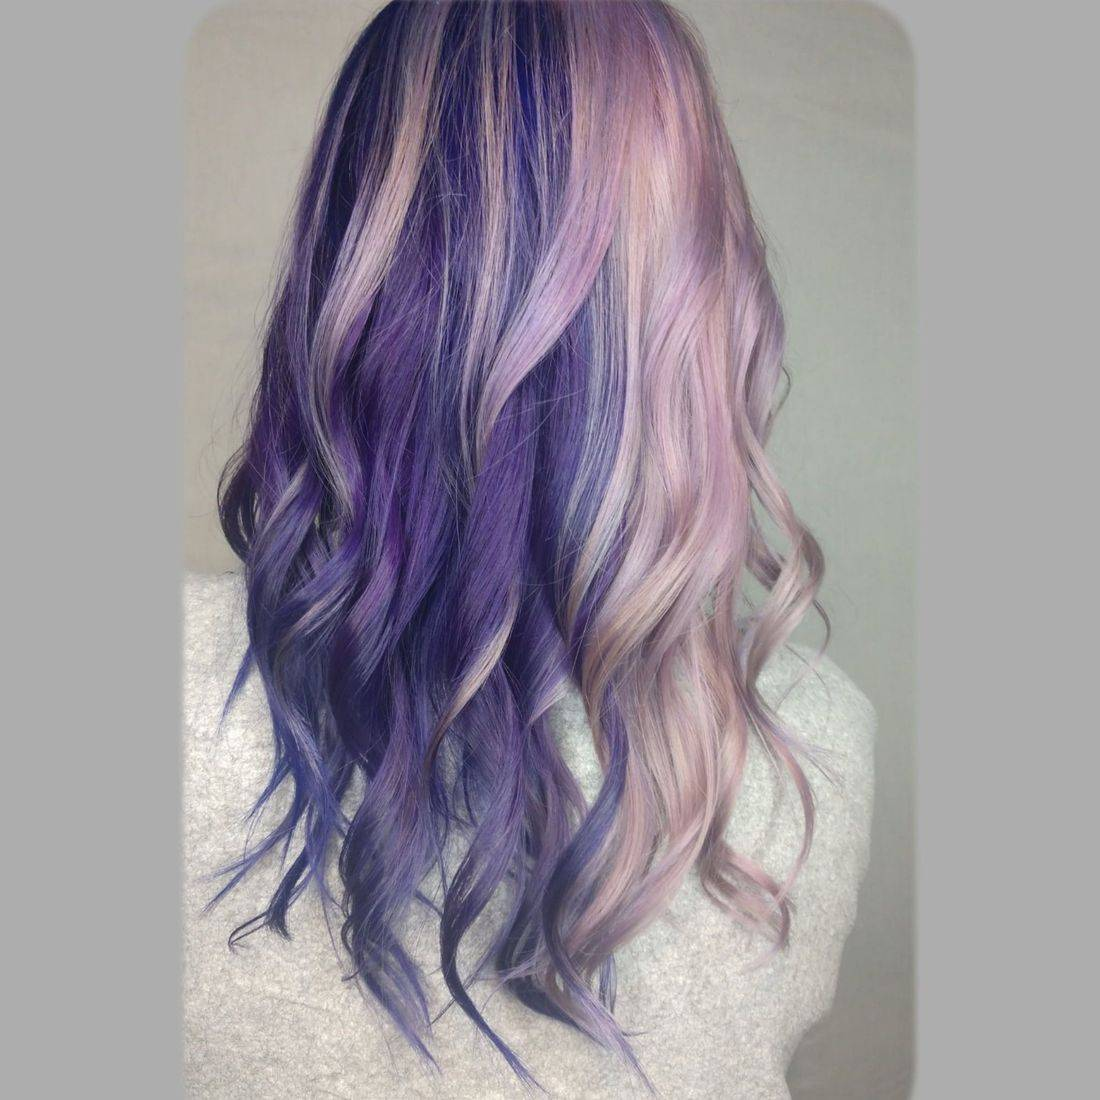 split dye purple hair pastel haircolor lavender olaplex certified covid safe